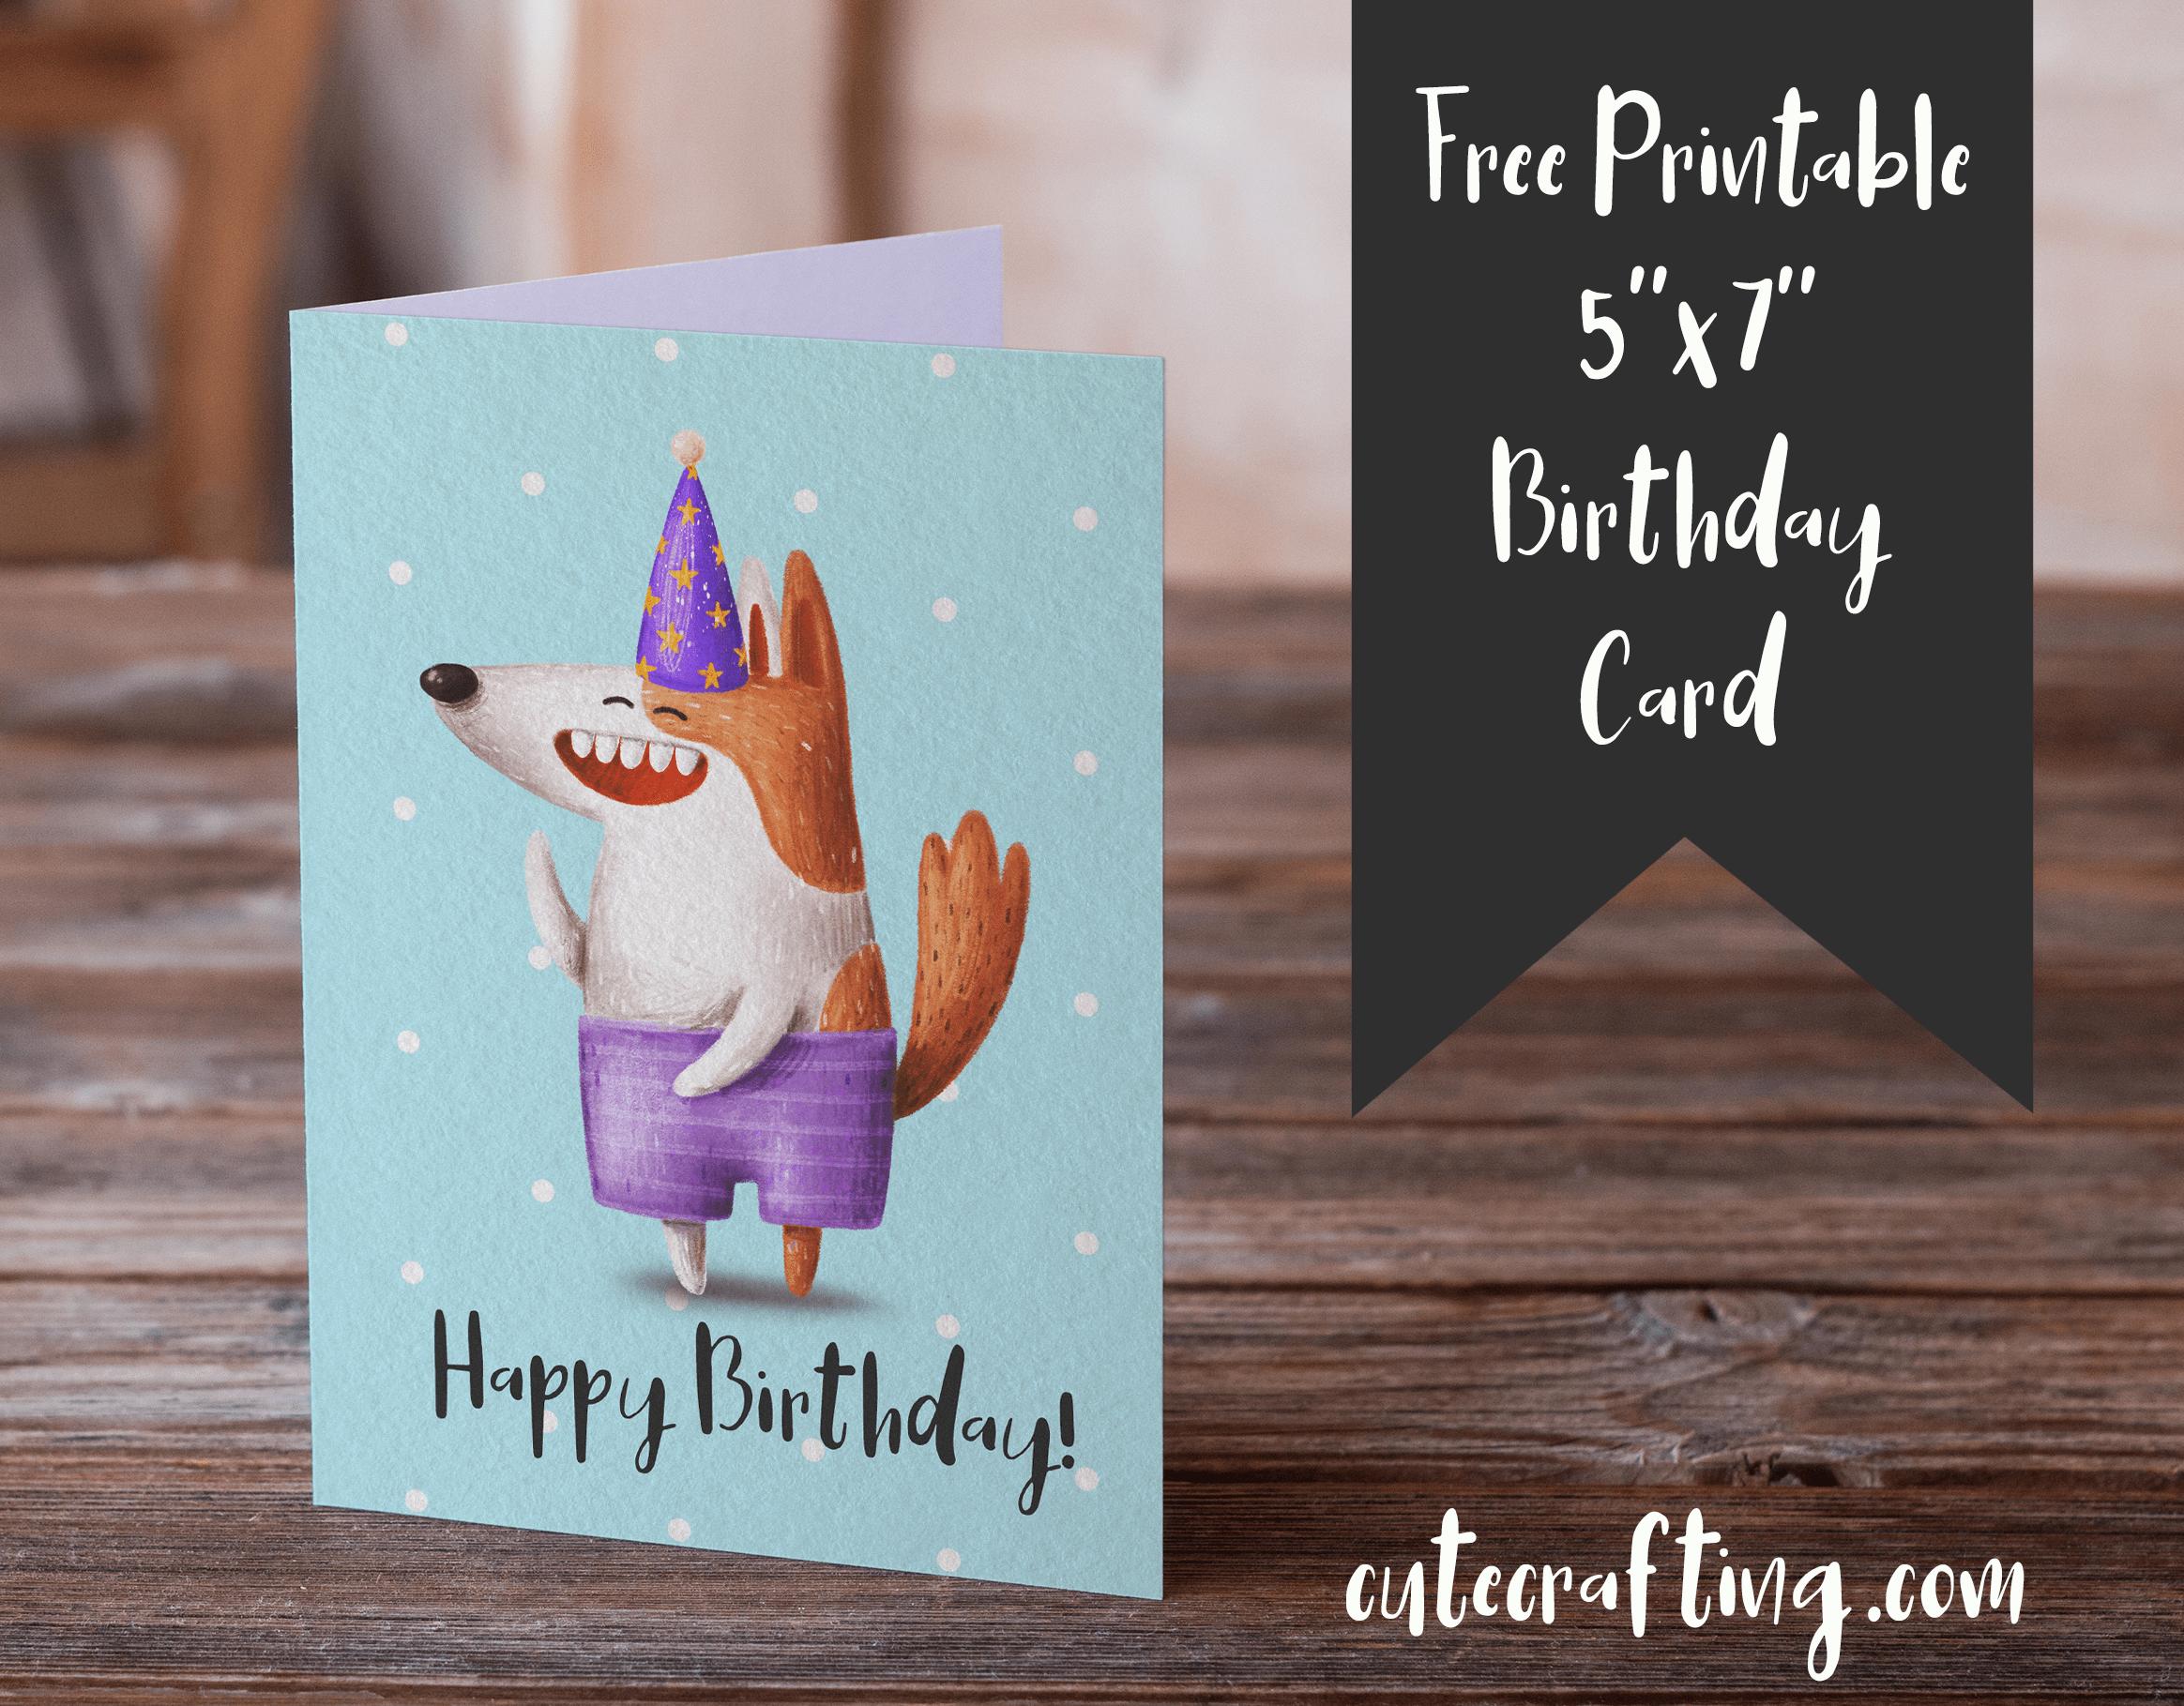 photo regarding Dog Birthday Cards Printable Free known as Absolutely free Printable Birthday Card Humorous Cartoon Doggy 5×7